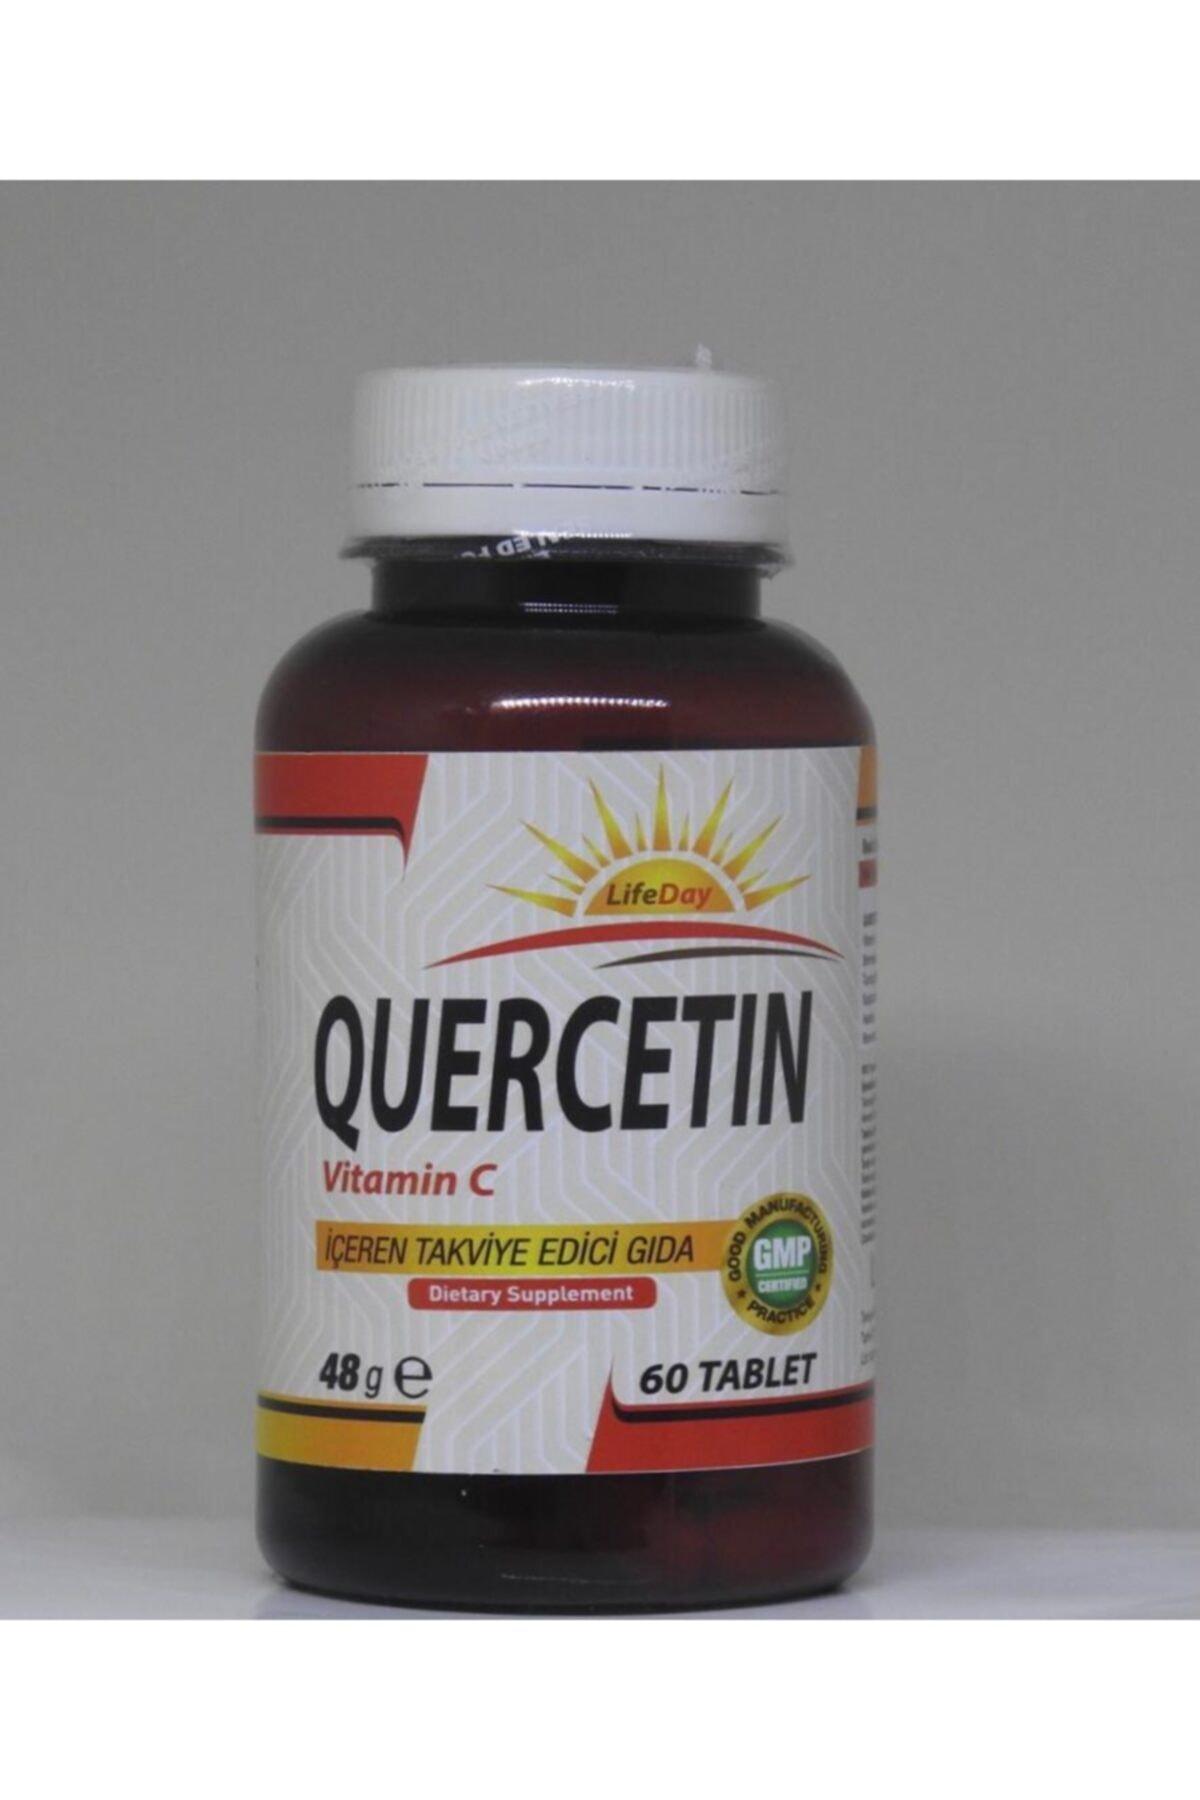 Lifeday Vitamin C Quercetin 250 mg 120 Tablet C 1